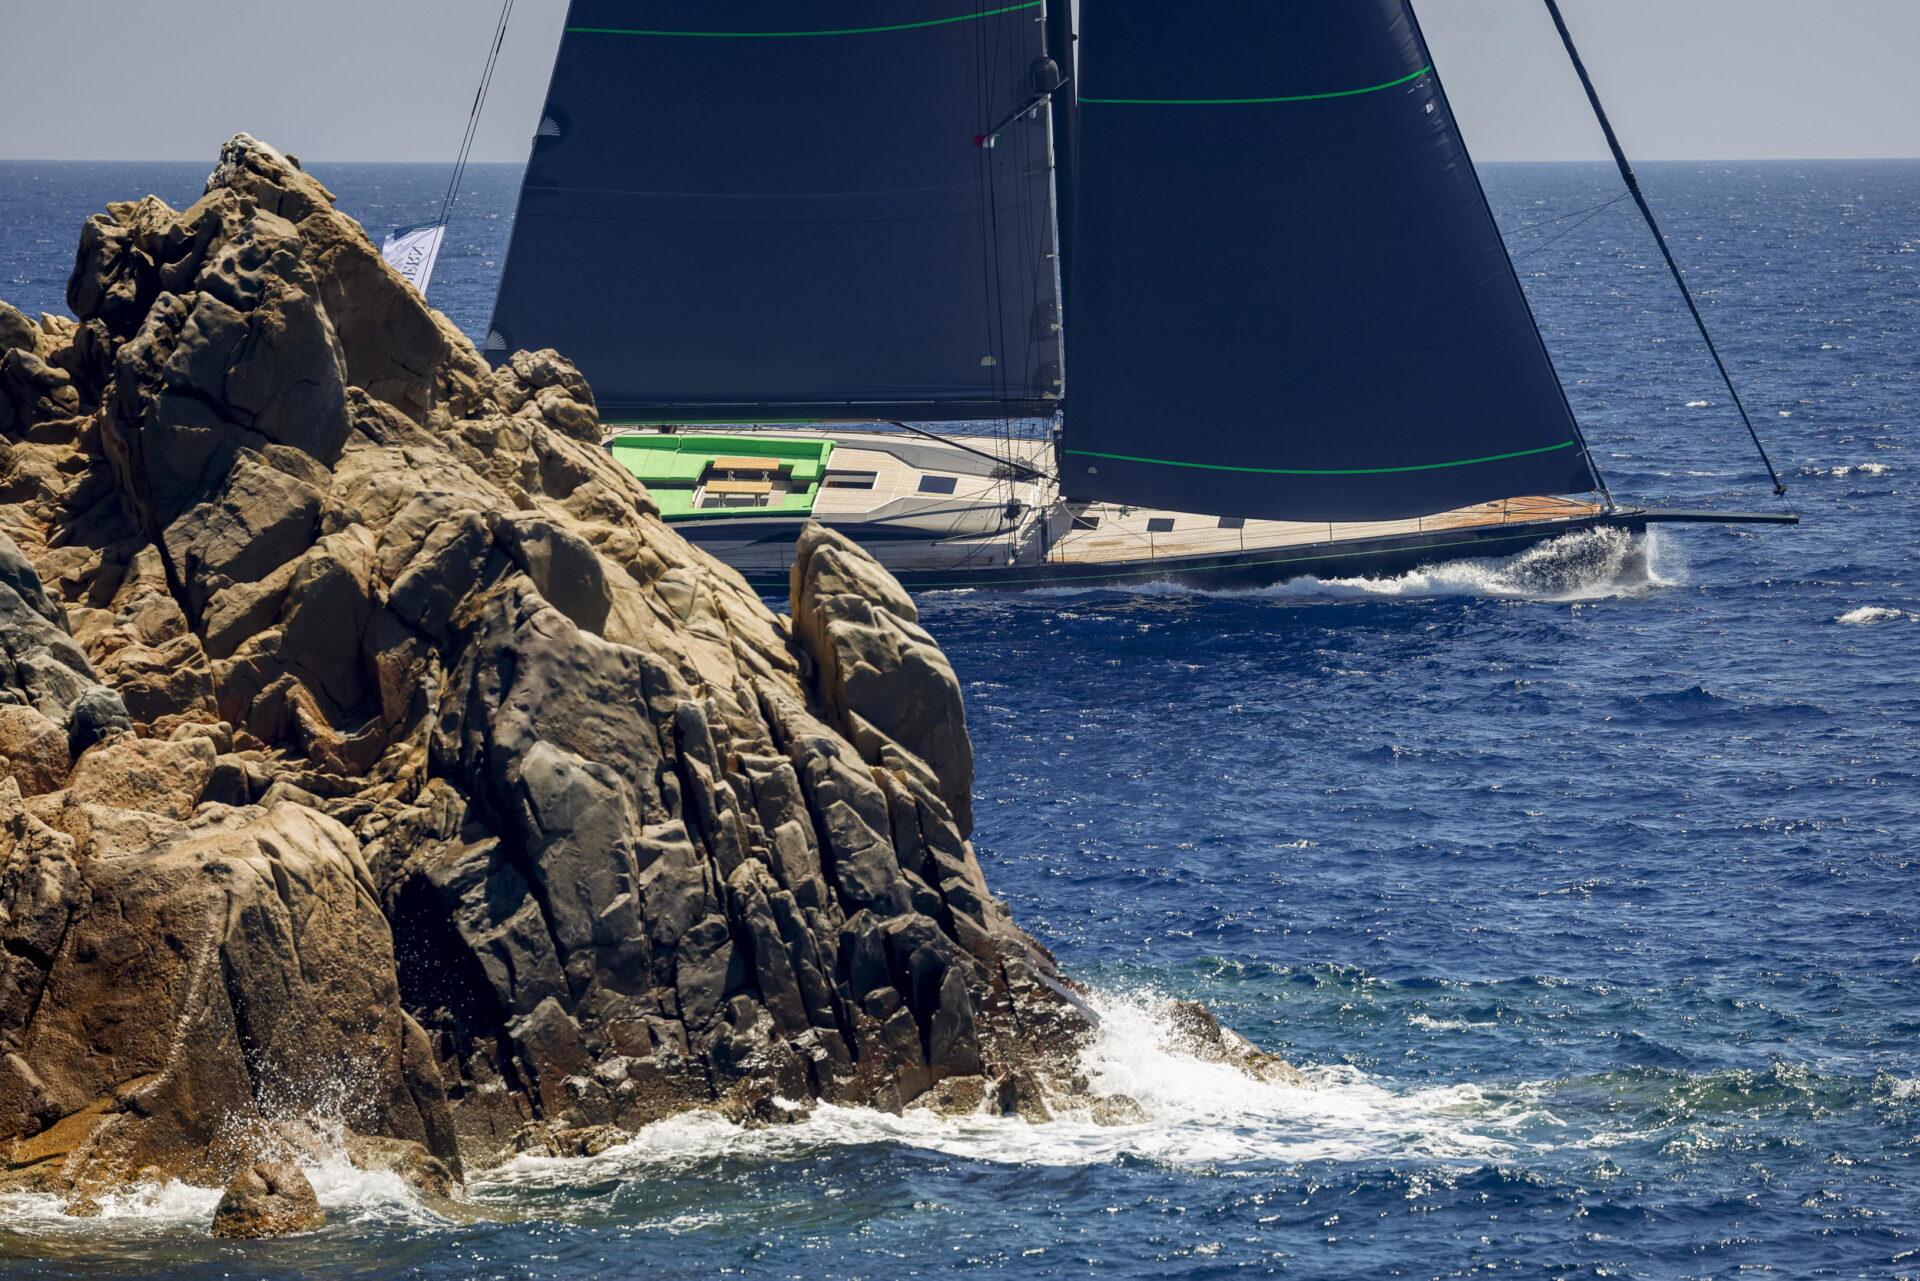 Loro Piana Superyacht Regatta 2021 SWS